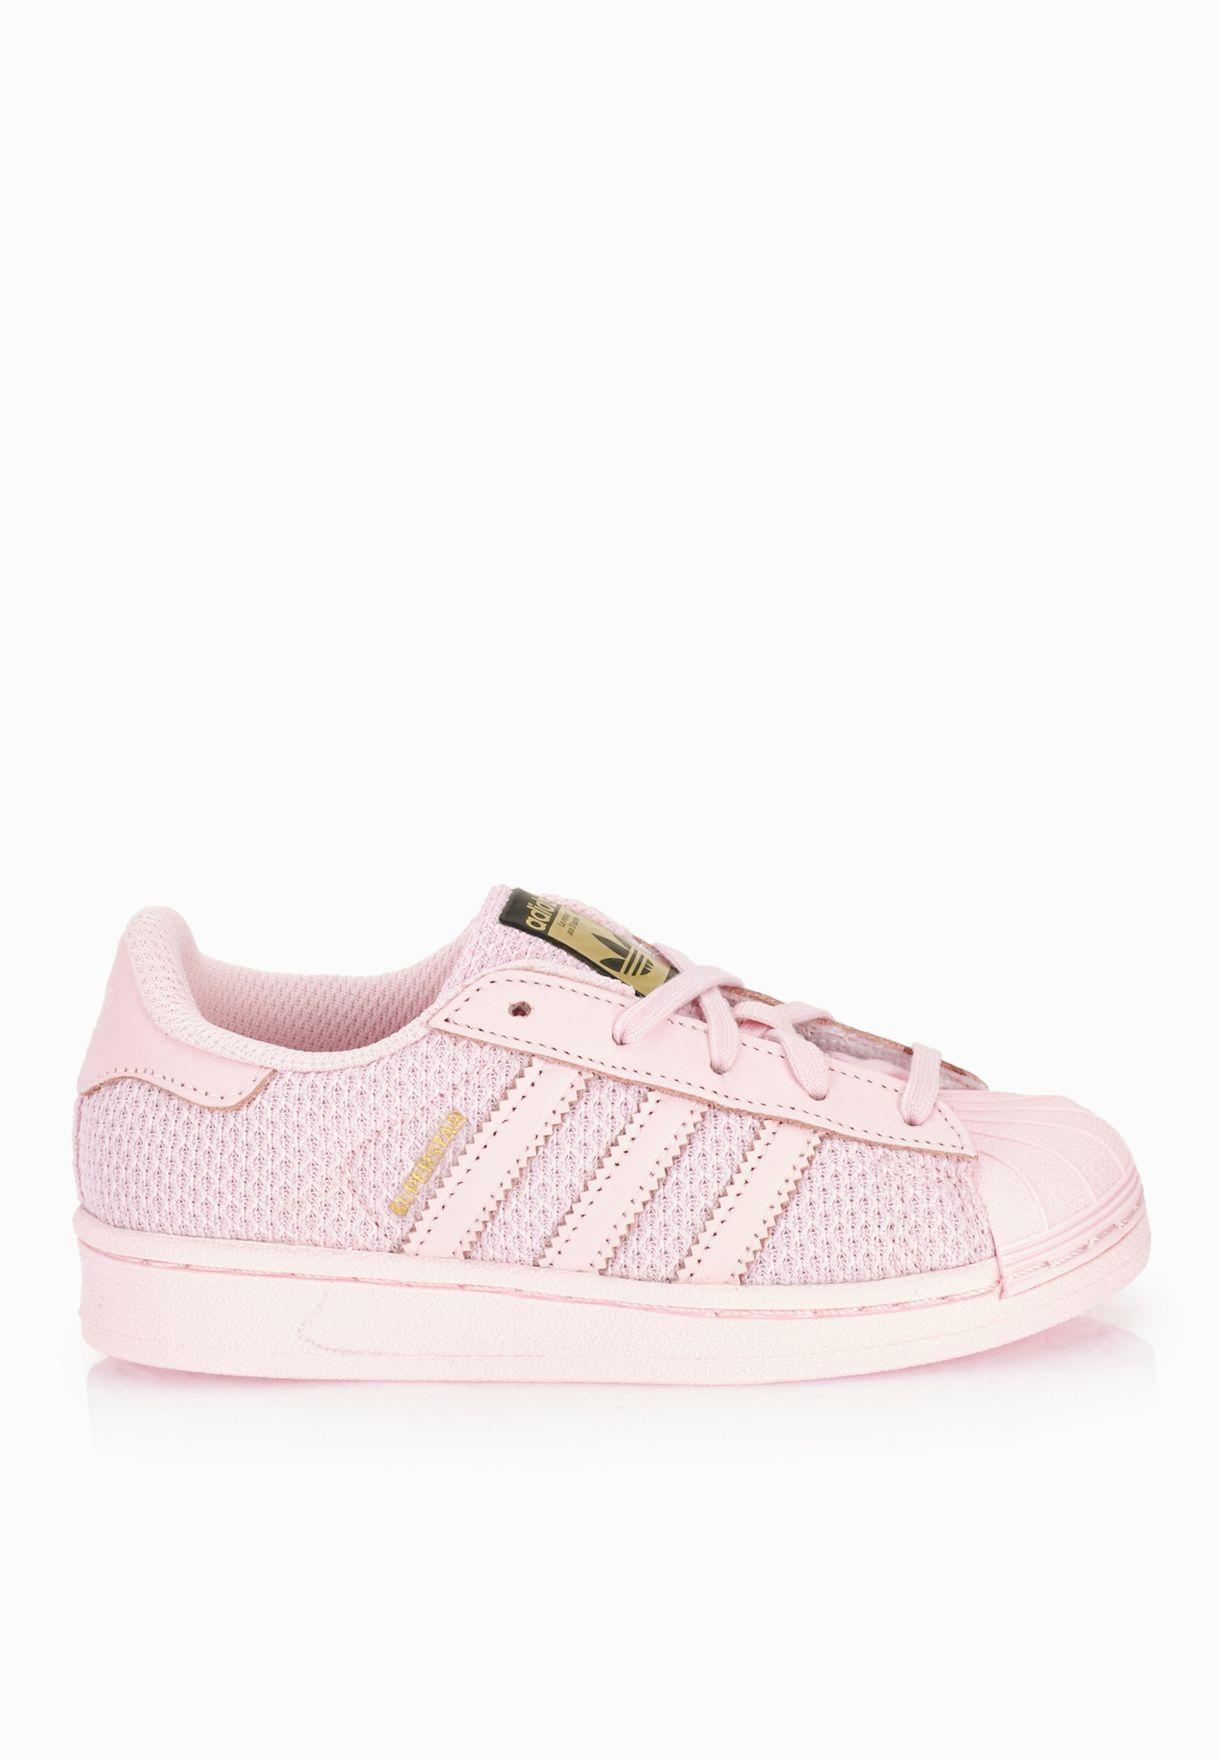 2eb2a3742ae Shop adidas Originals pink Superstar Kids S76616 for Kids in UAE ...